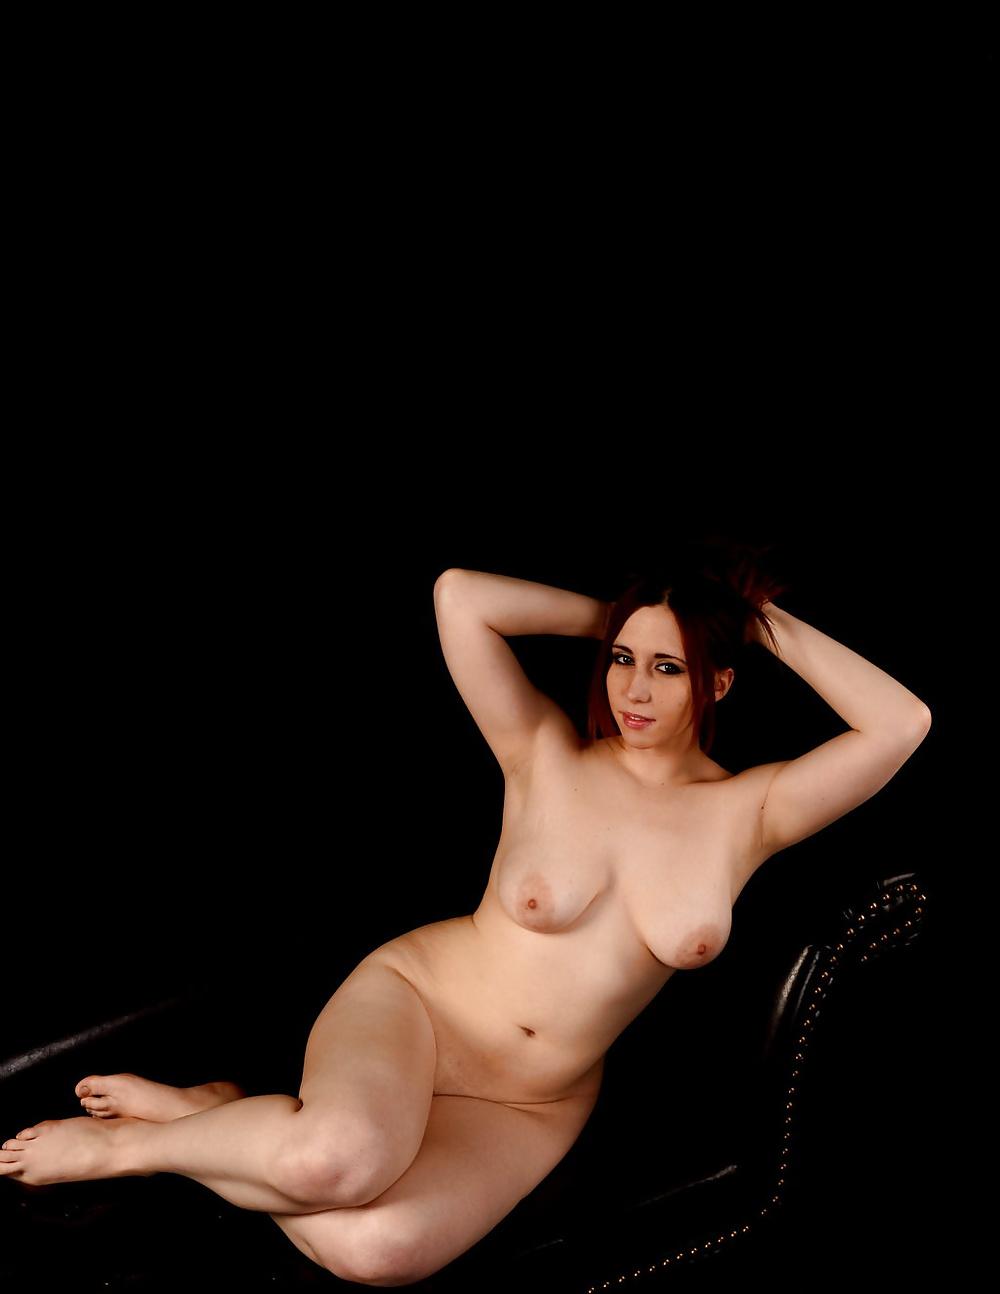 Stephanie van rijn nudes